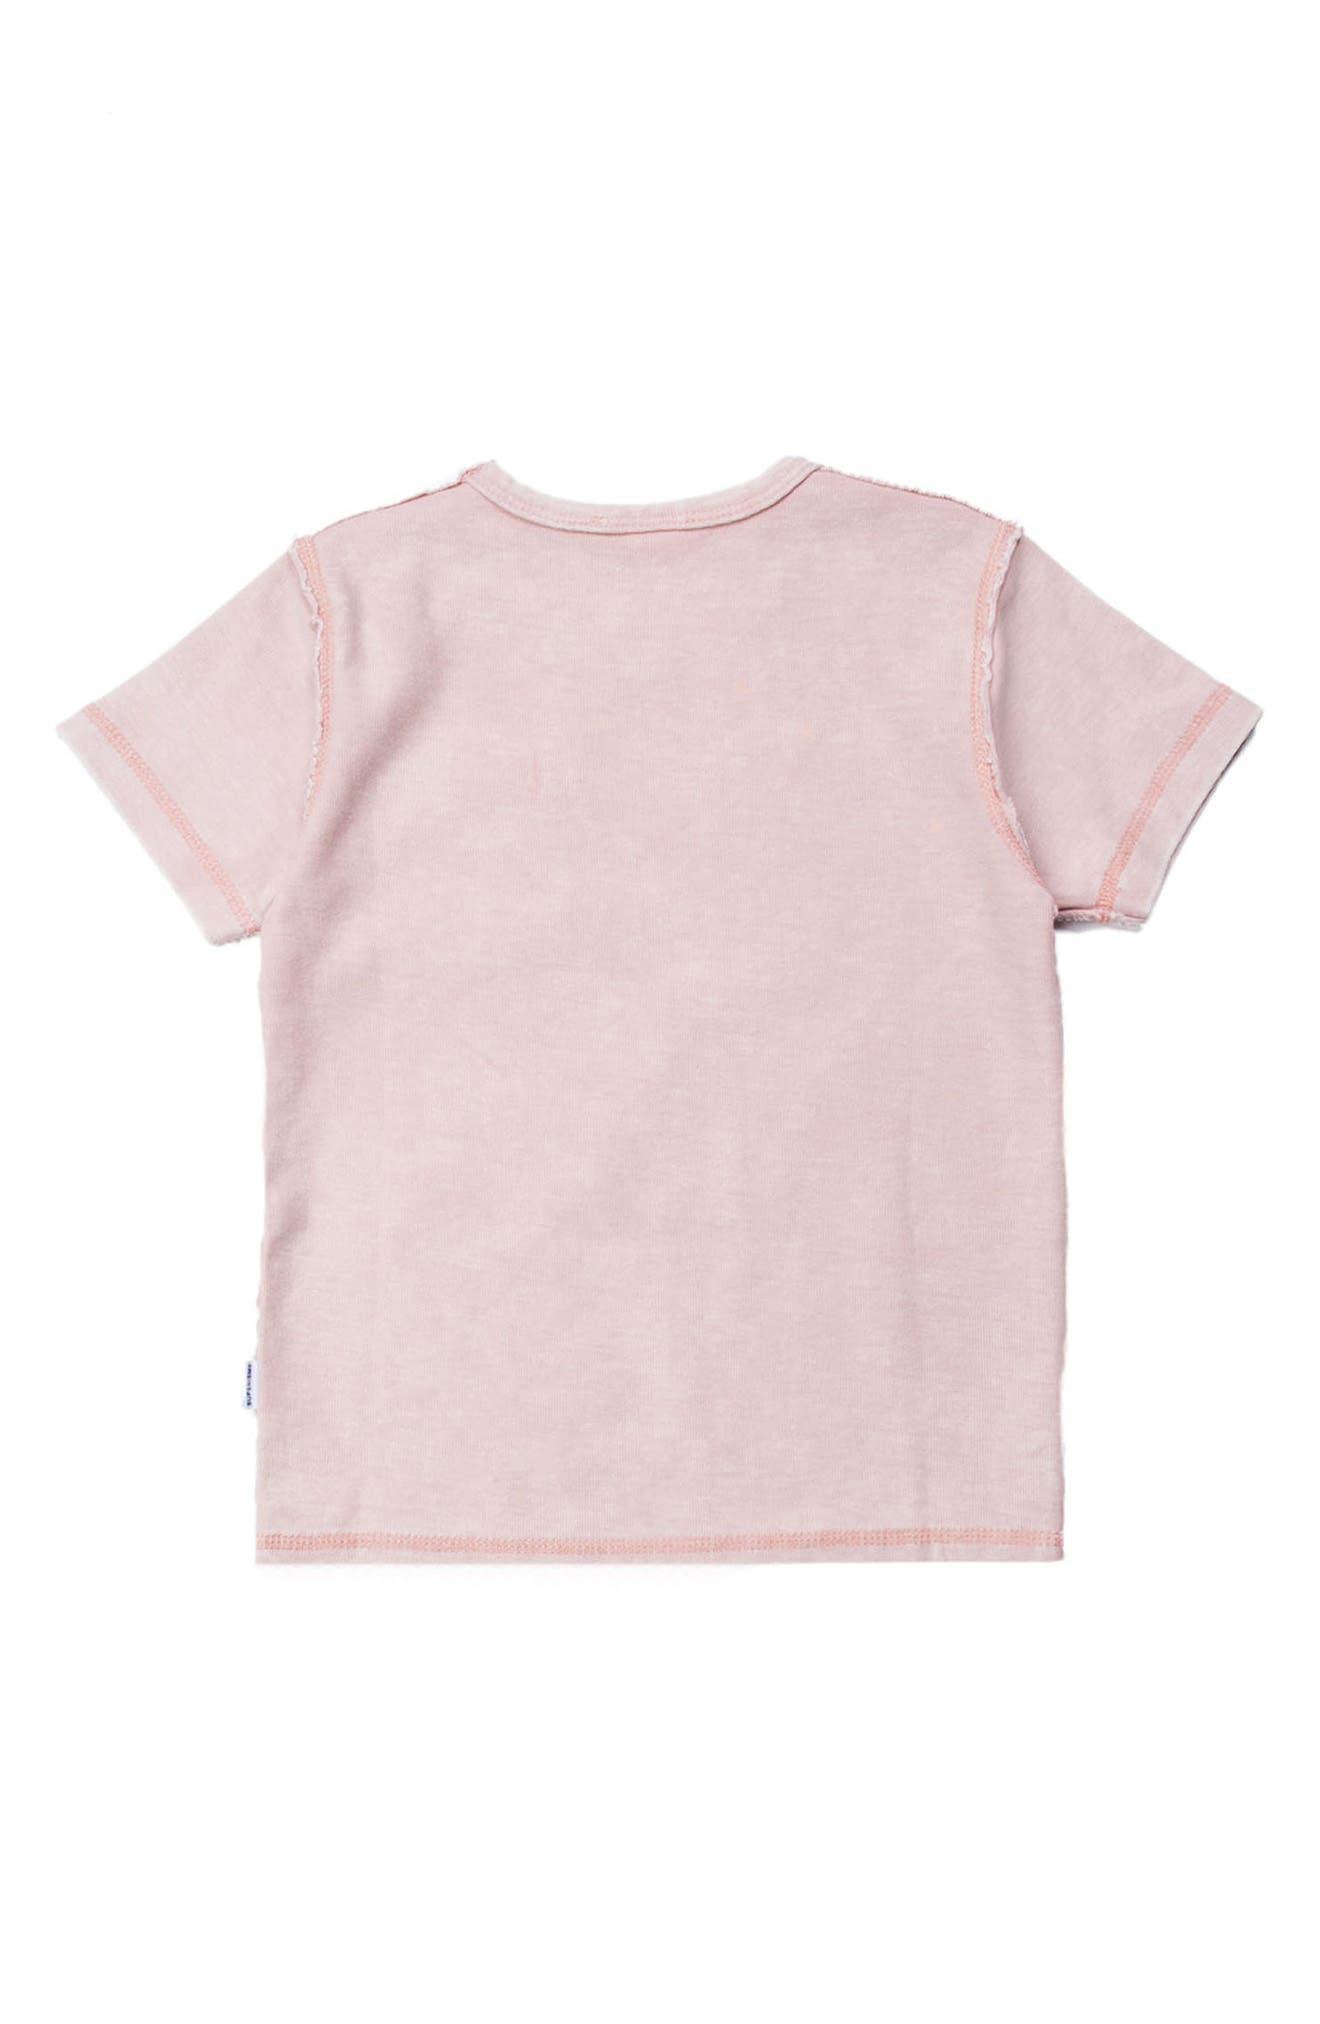 Emery Pocket T-Shirt,                             Alternate thumbnail 2, color,                             650